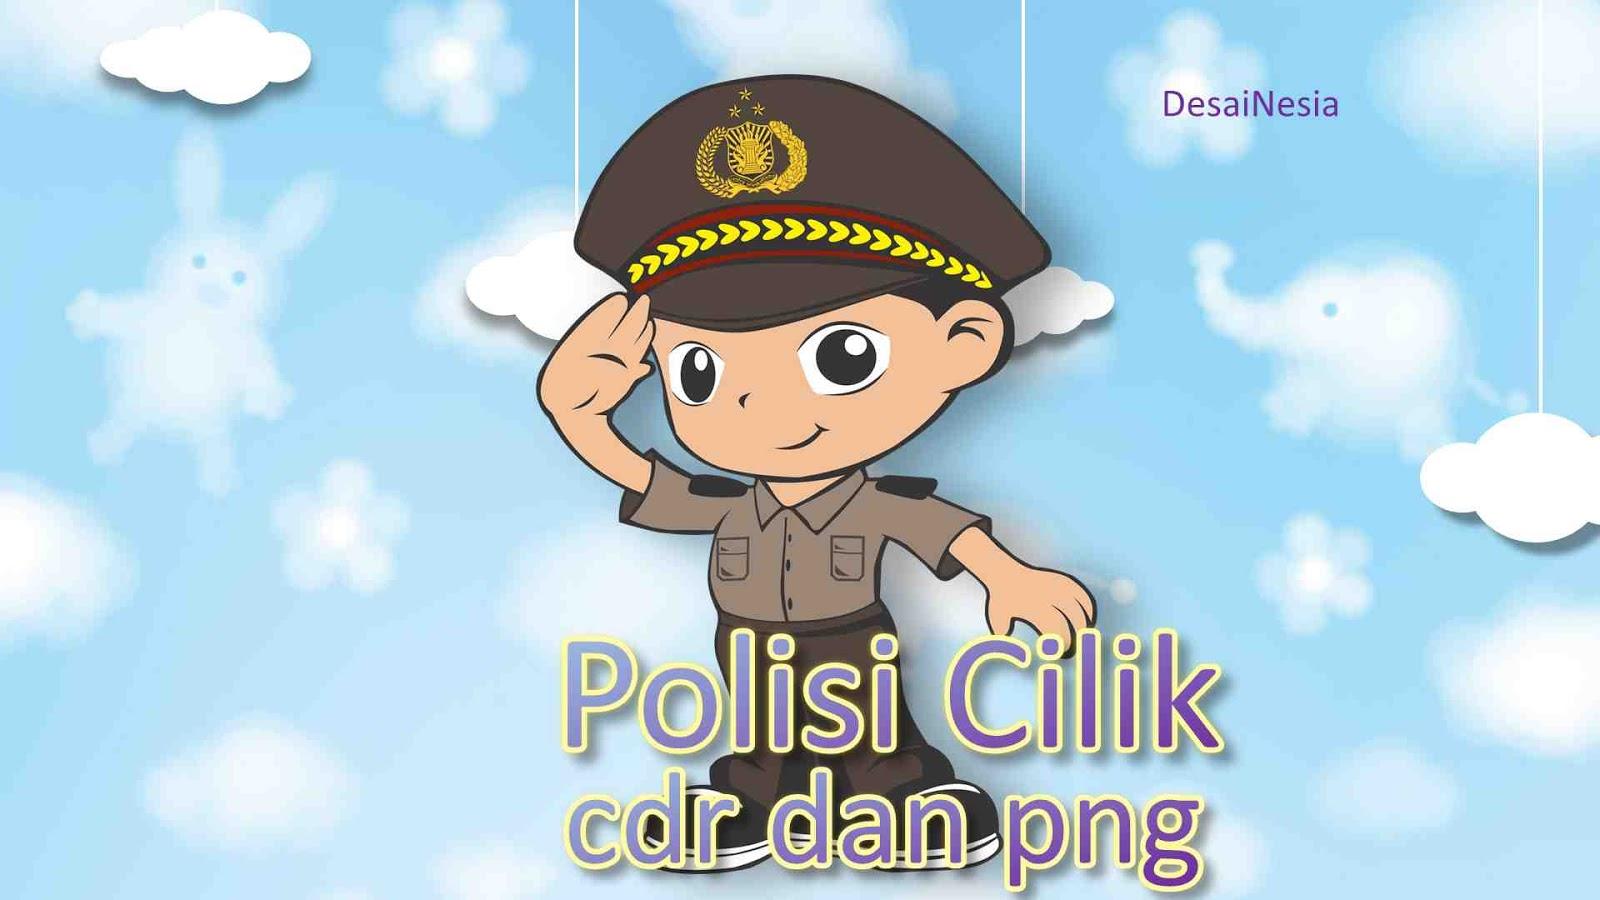 polisicilik